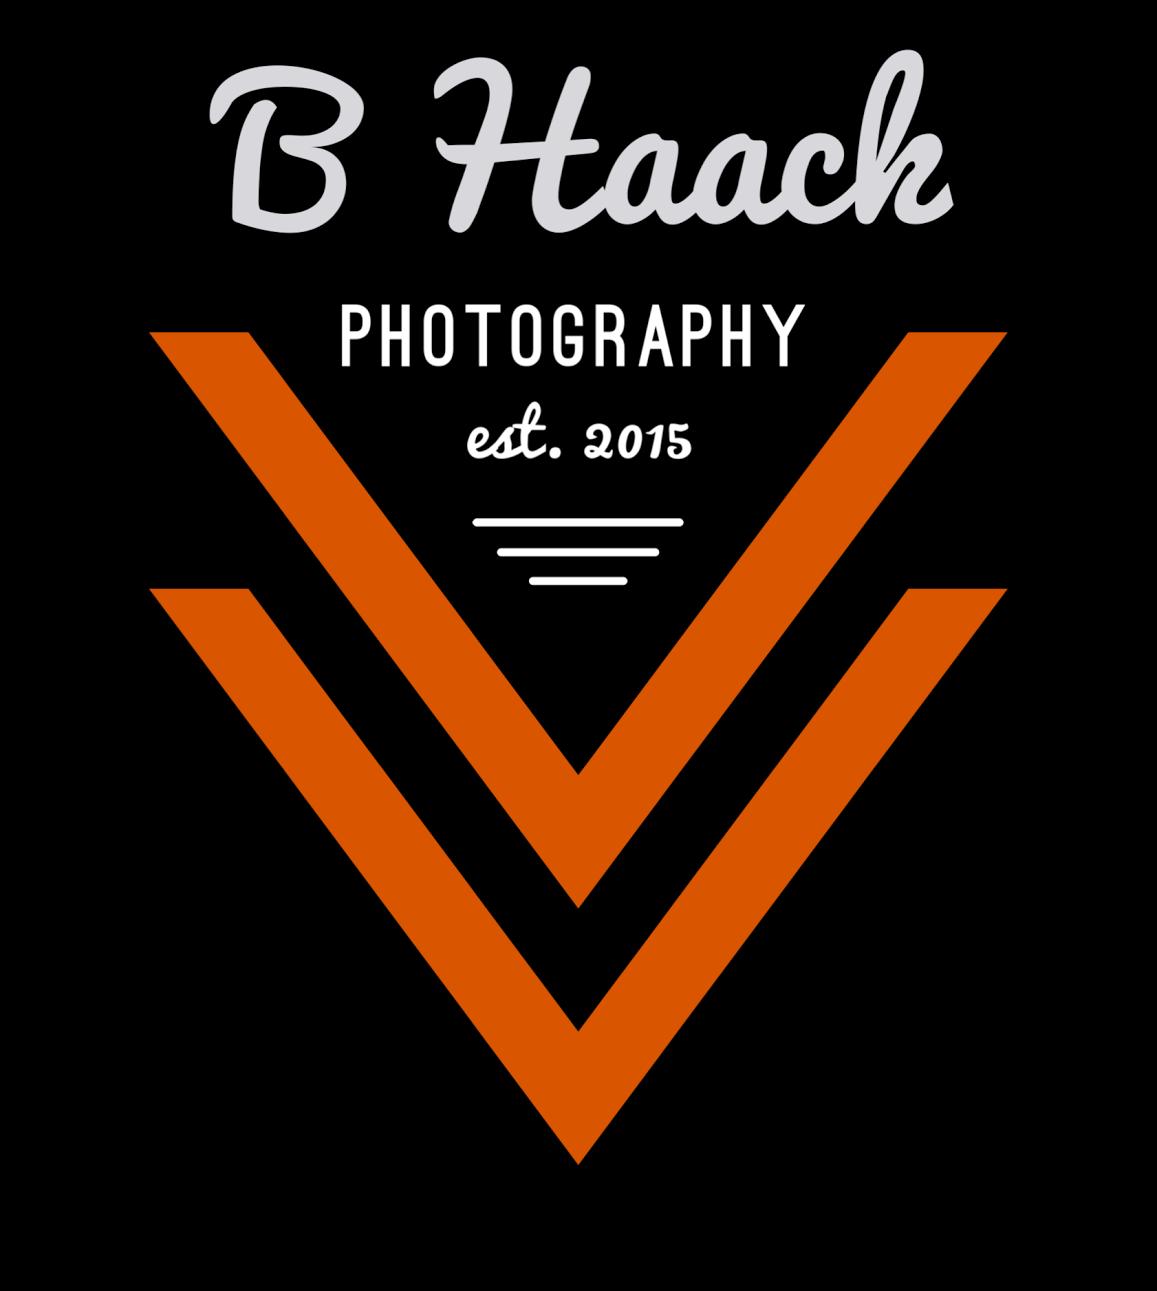 Bryce Haack